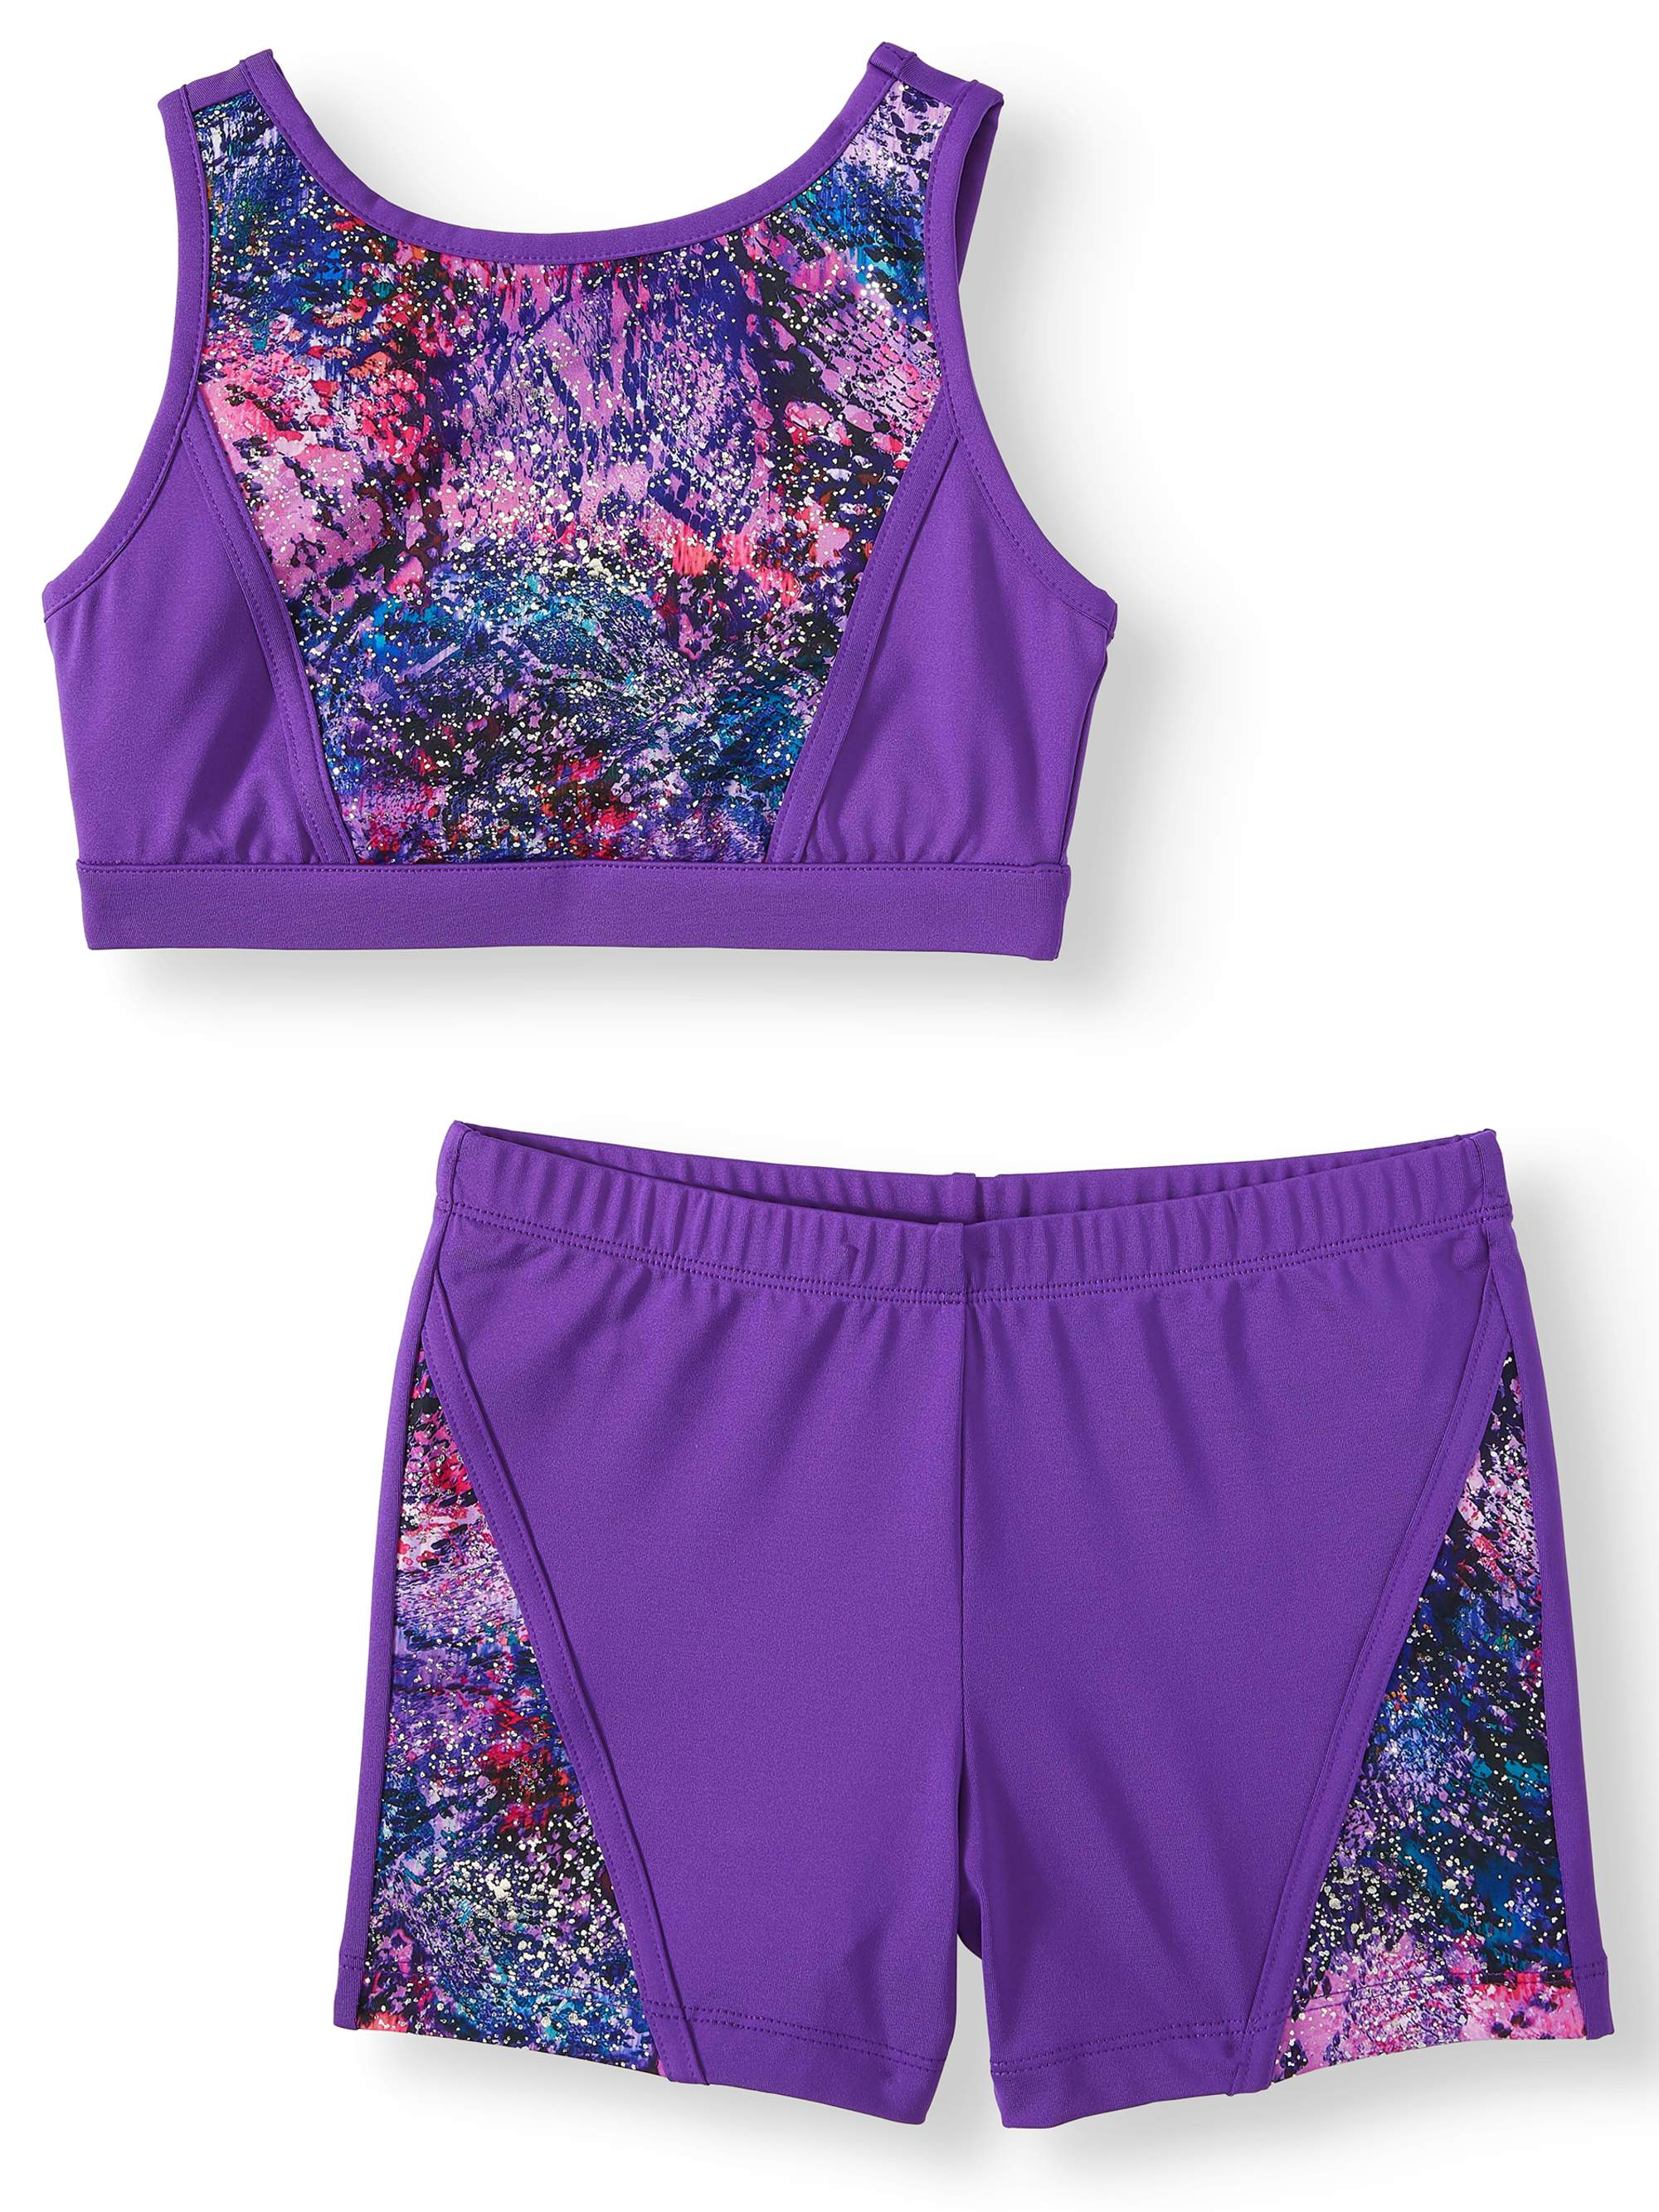 Danskin Now Danskin Now Girls Dance Gymnastics Snakeskin Bra Top And Bike Short Set Little Girls Big Girls Walmart Com Walmart Com